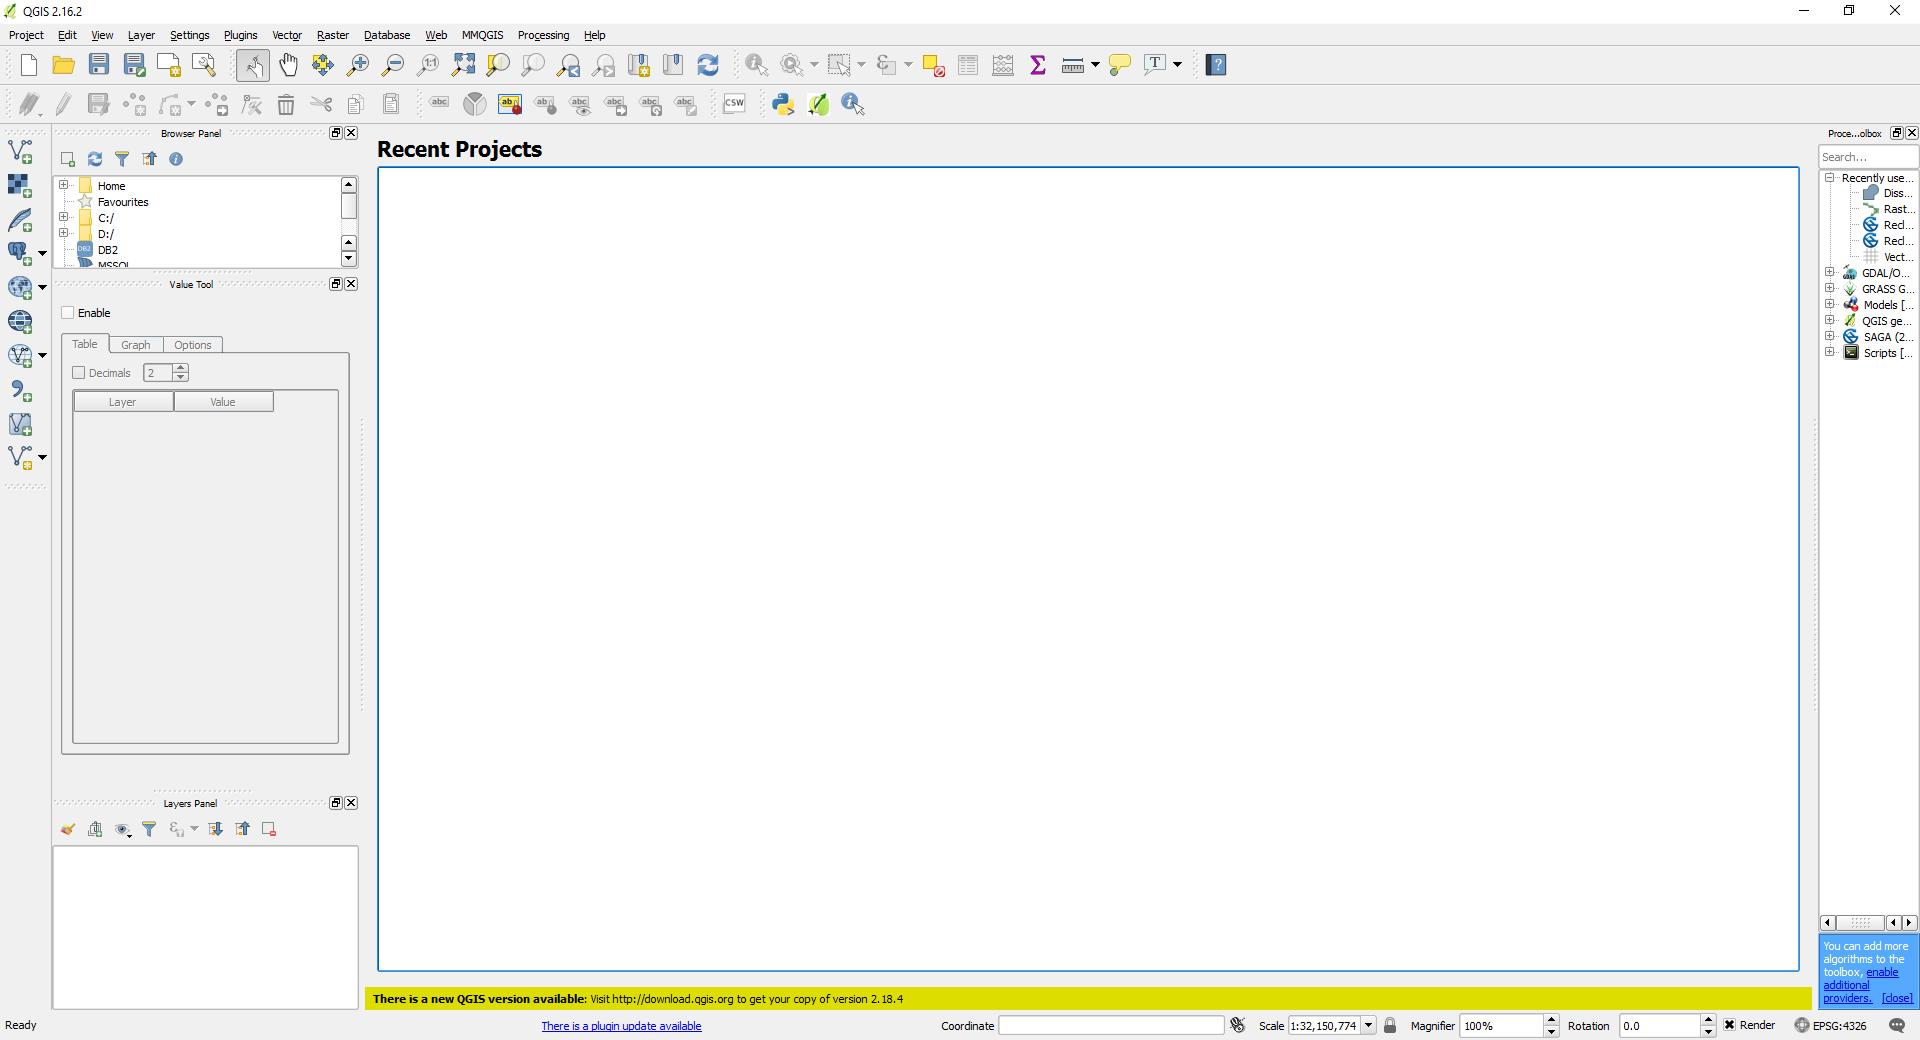 Key Processing Steps - SNODAS Tools (Developer Manual)